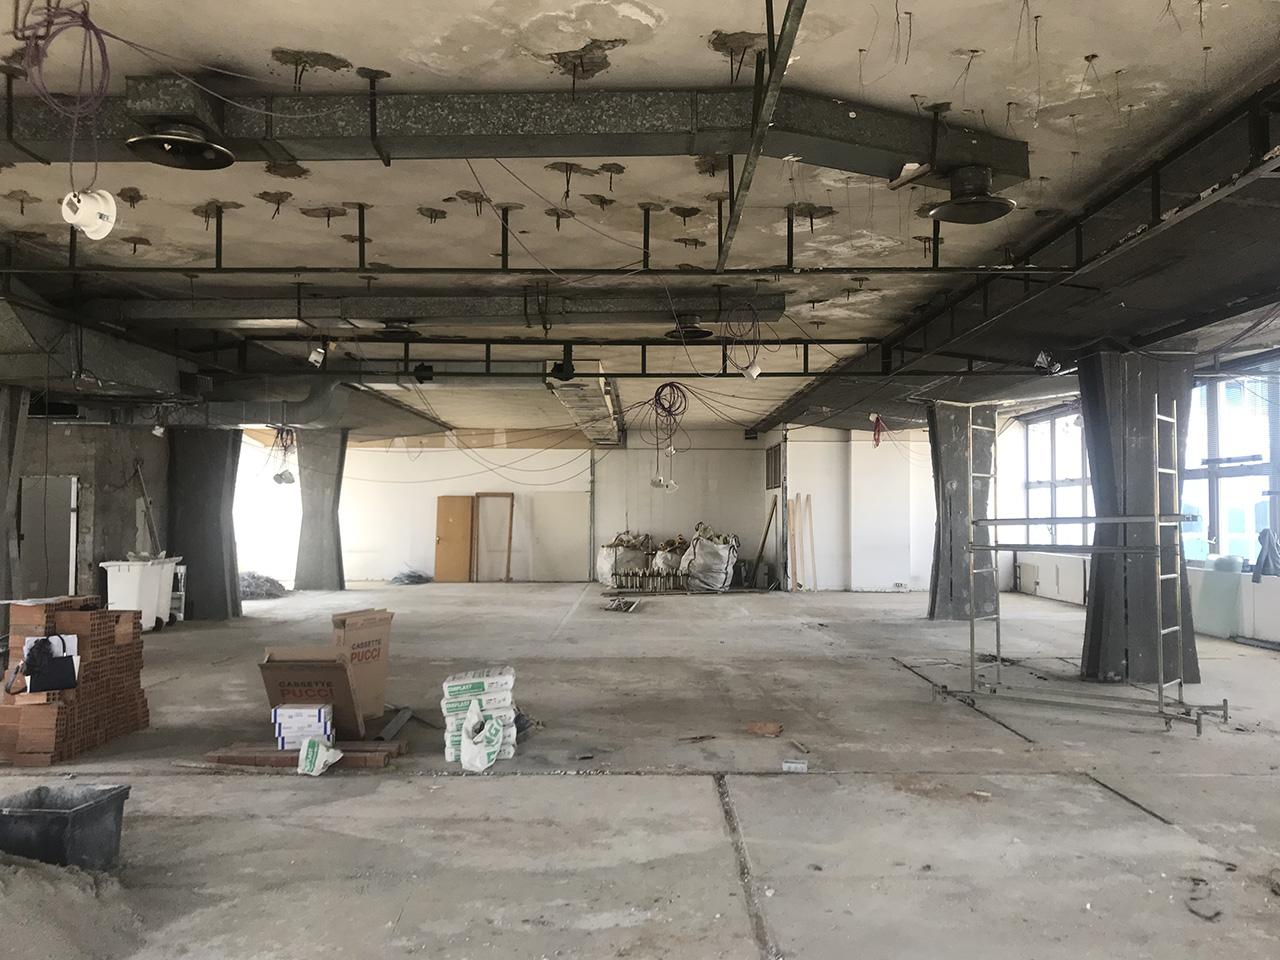 Office 525 sqm (5651 sqft) open space renovation